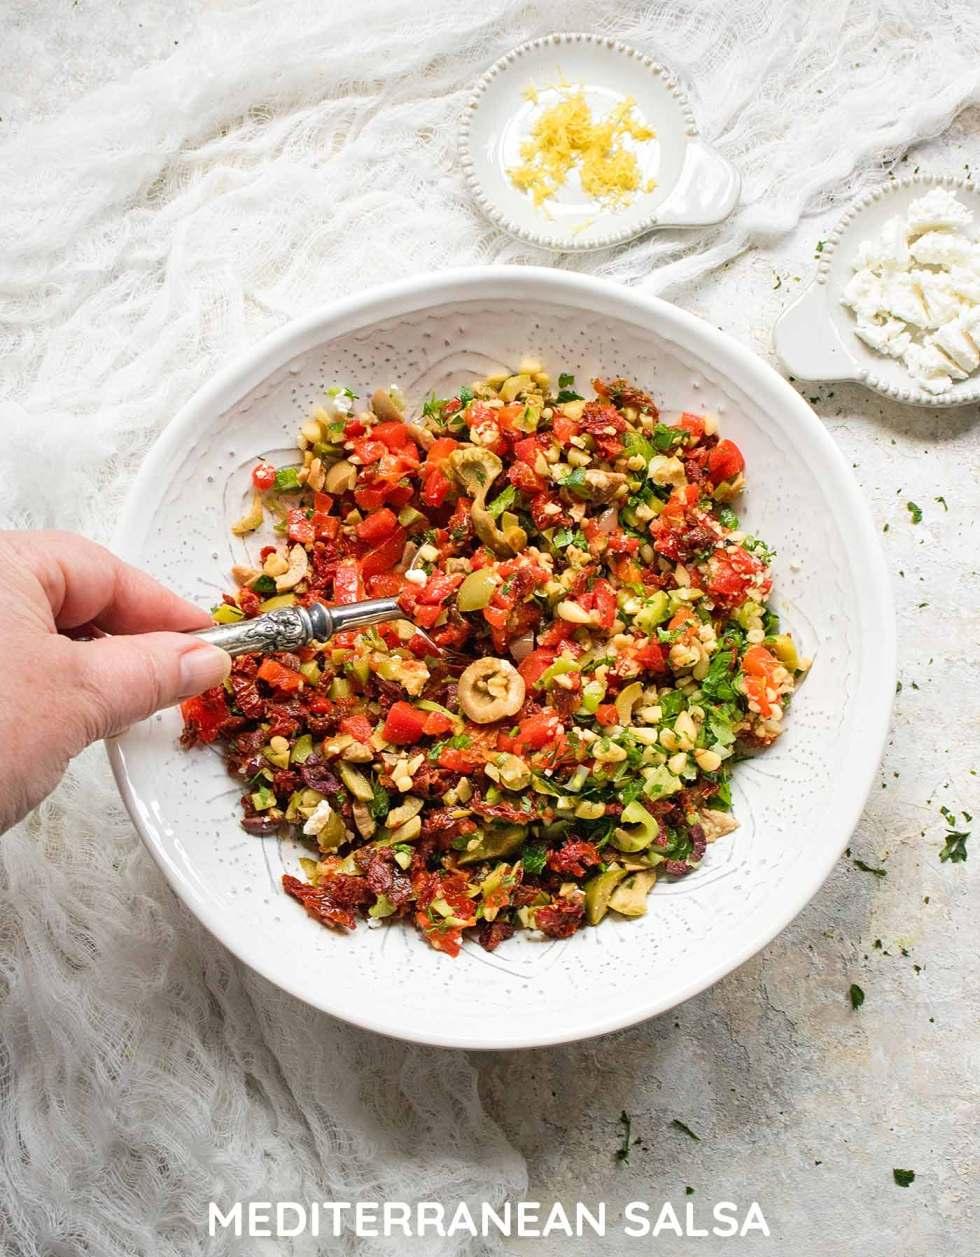 Mediterranean Salsa - Recipe at SoupAddict.com